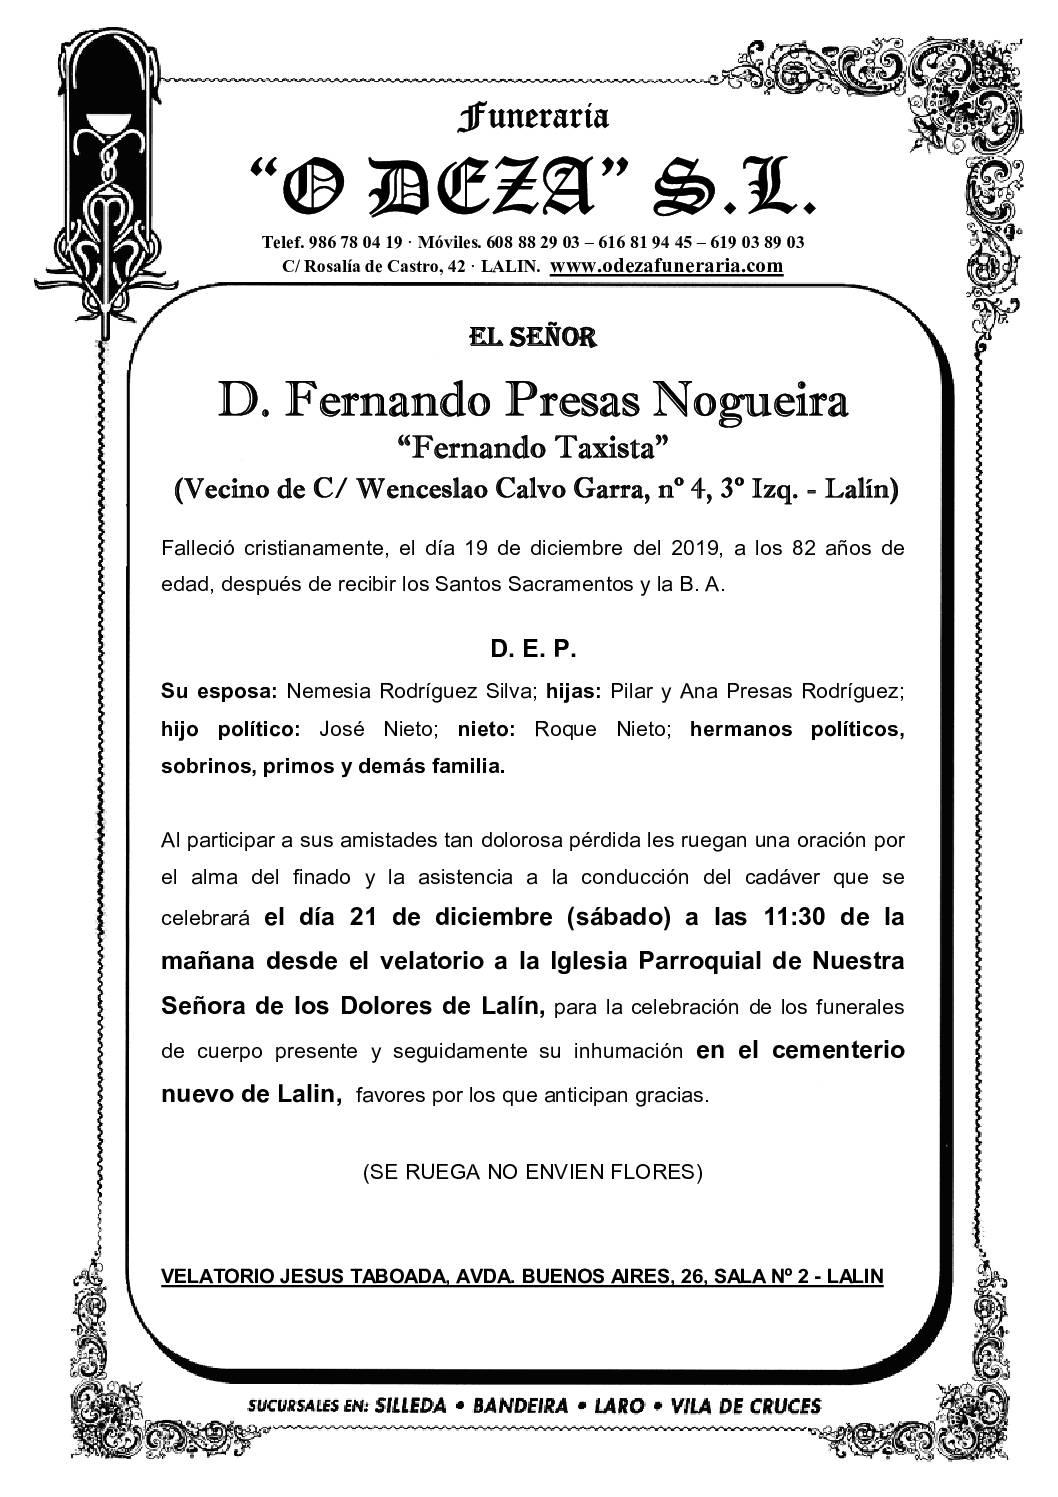 D. FERNANDO PRESAS NOGUEIRA